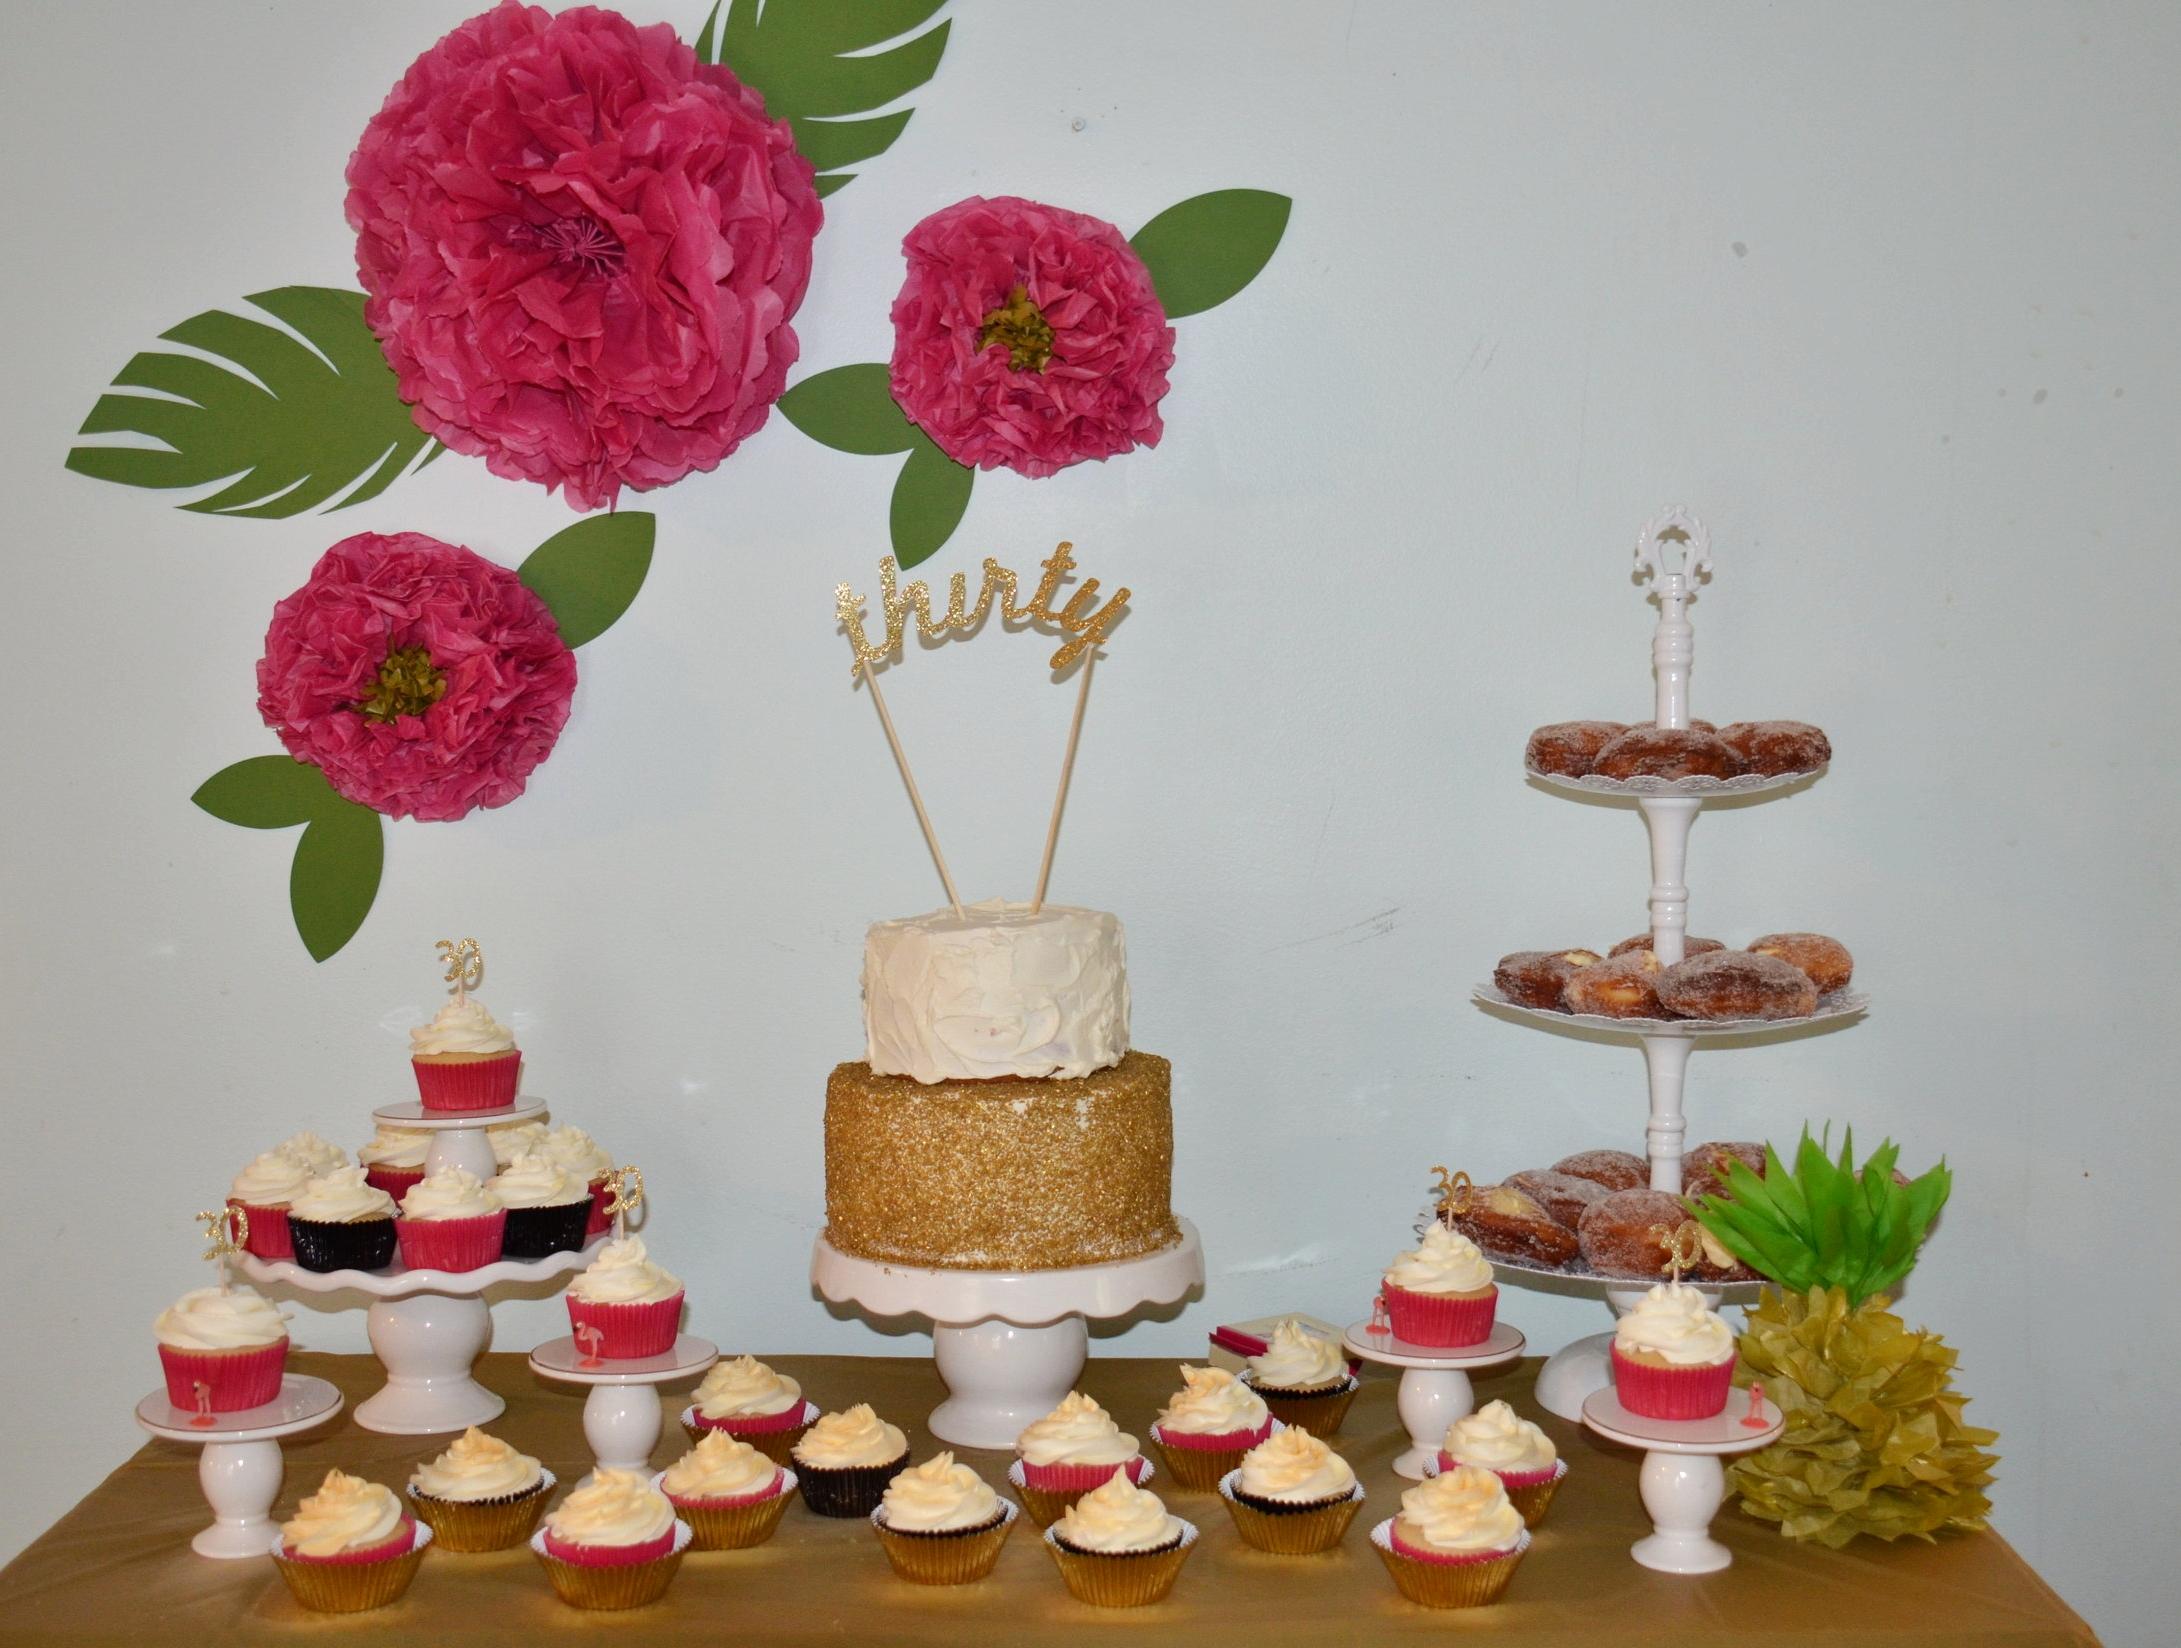 Yummy desserts! Cake, cupcakes, and bomboli, the most amazing Italian donut!